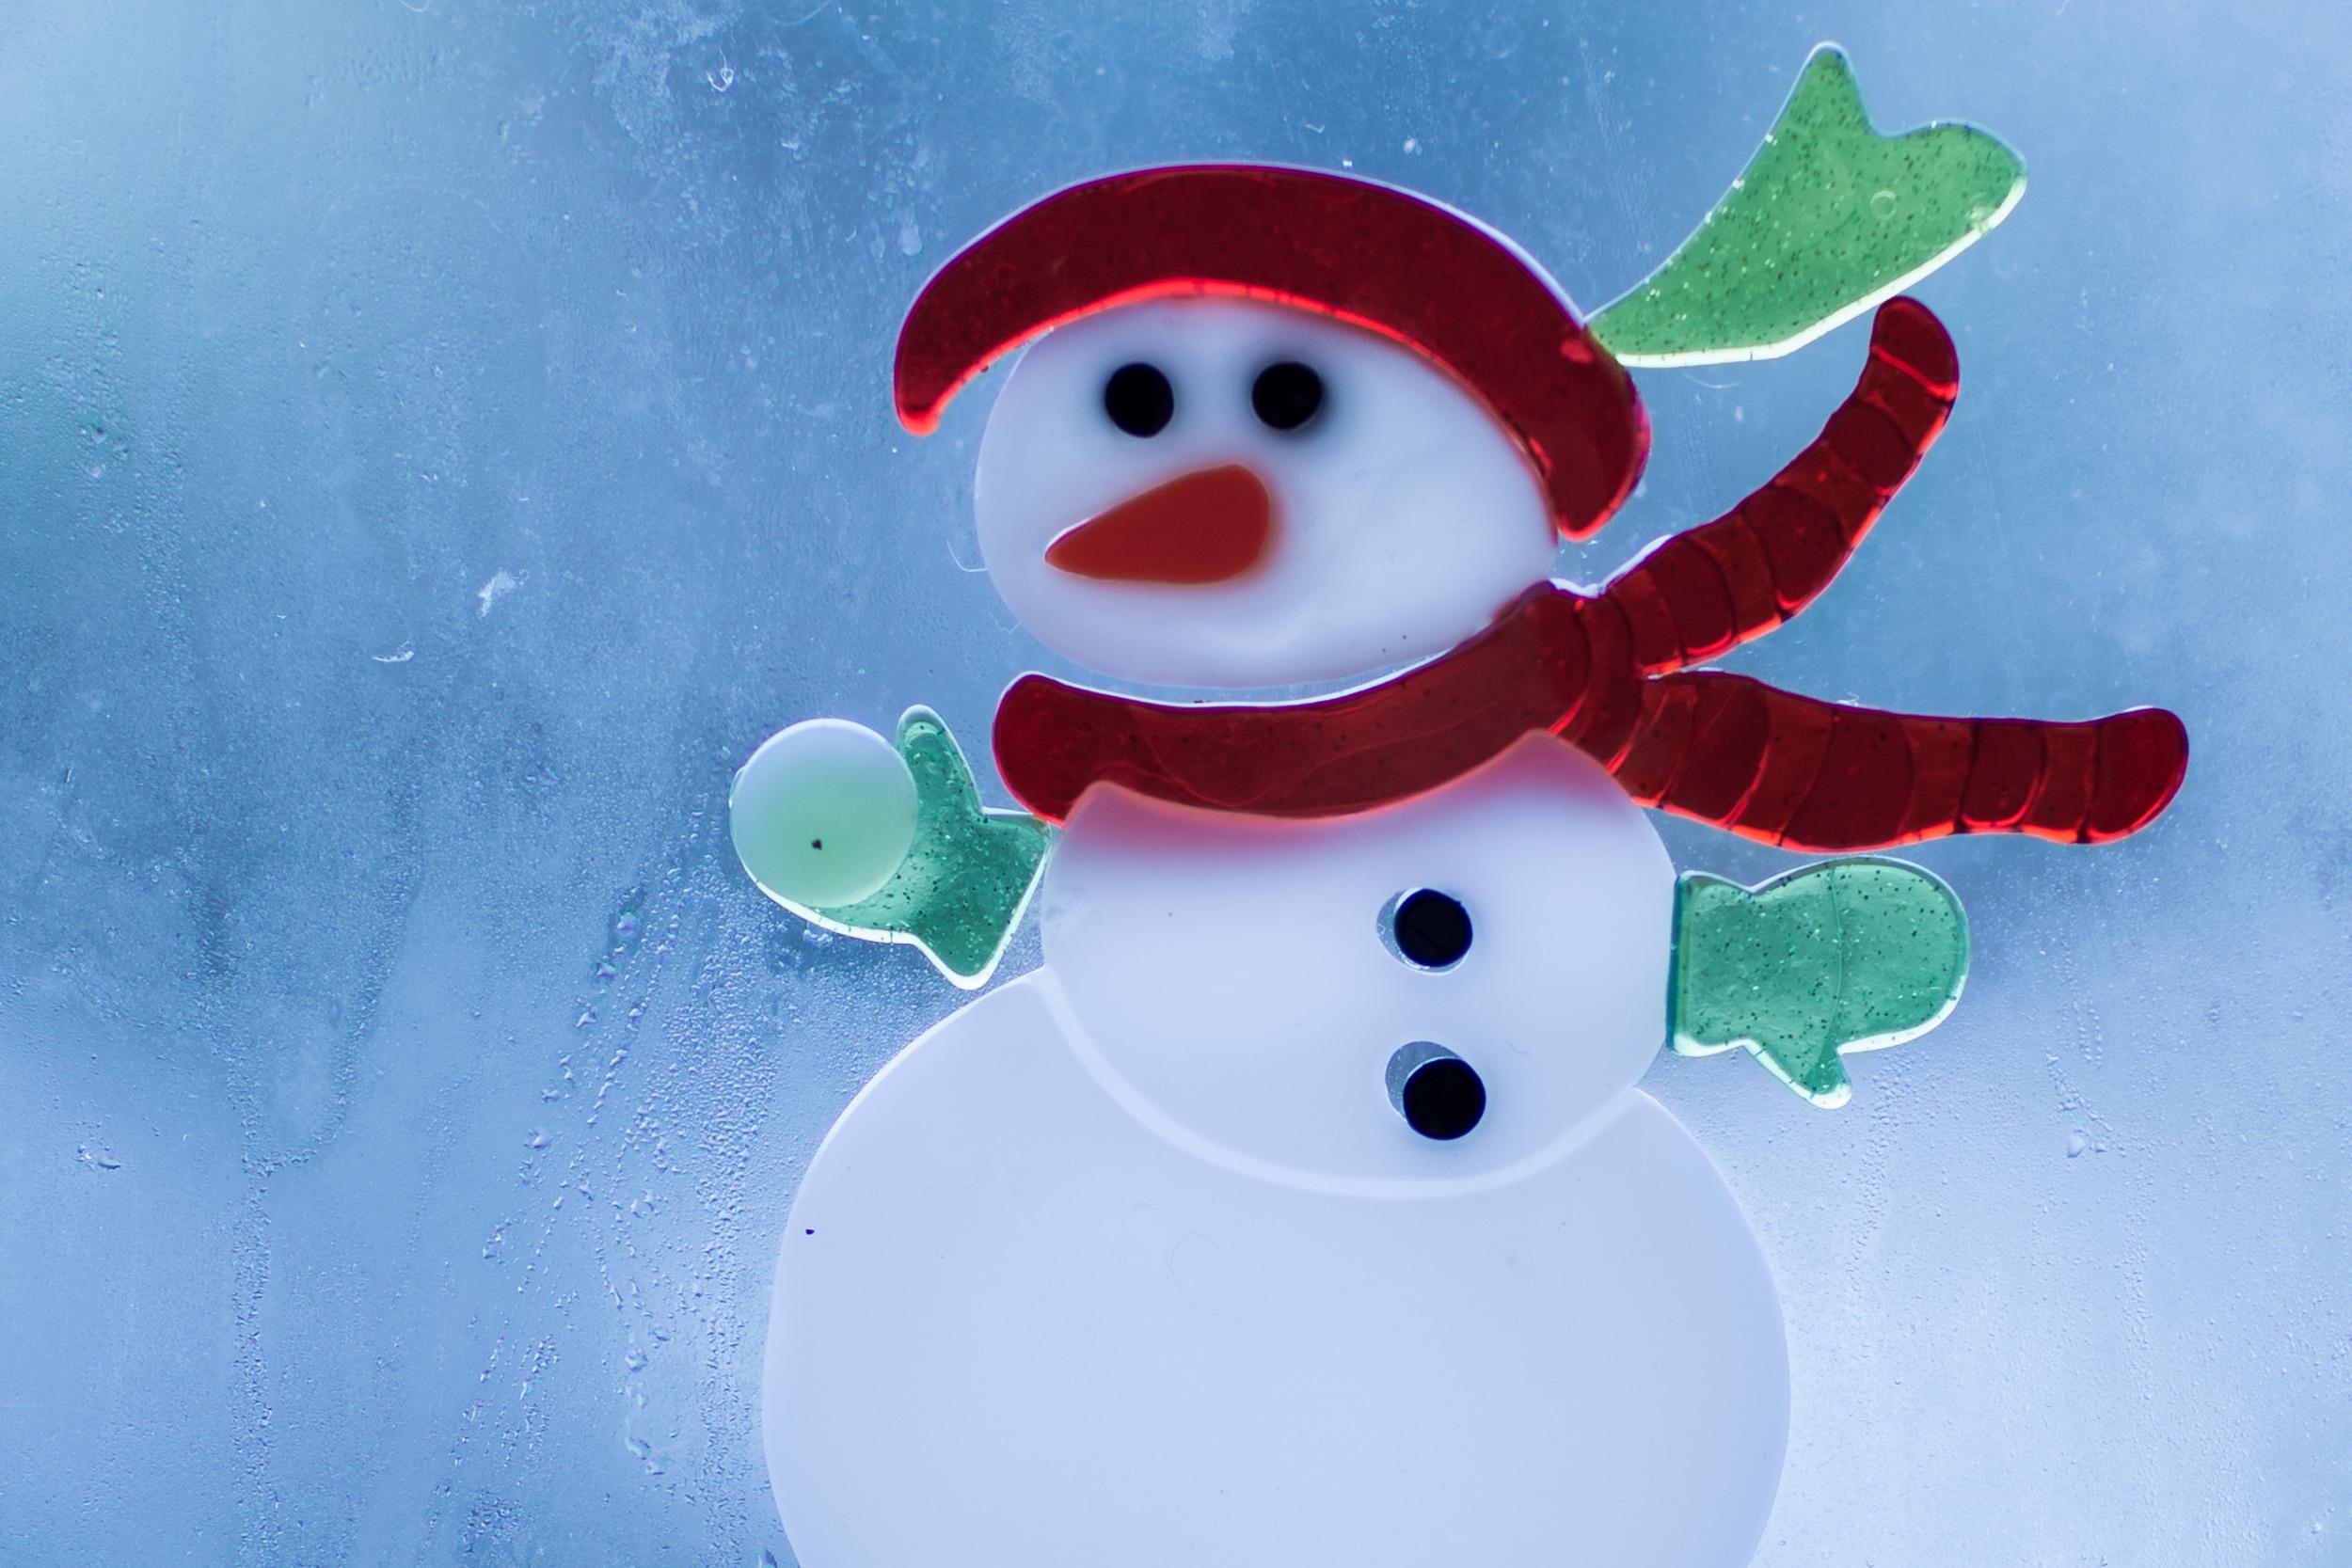 Snowman ready to throw the ball